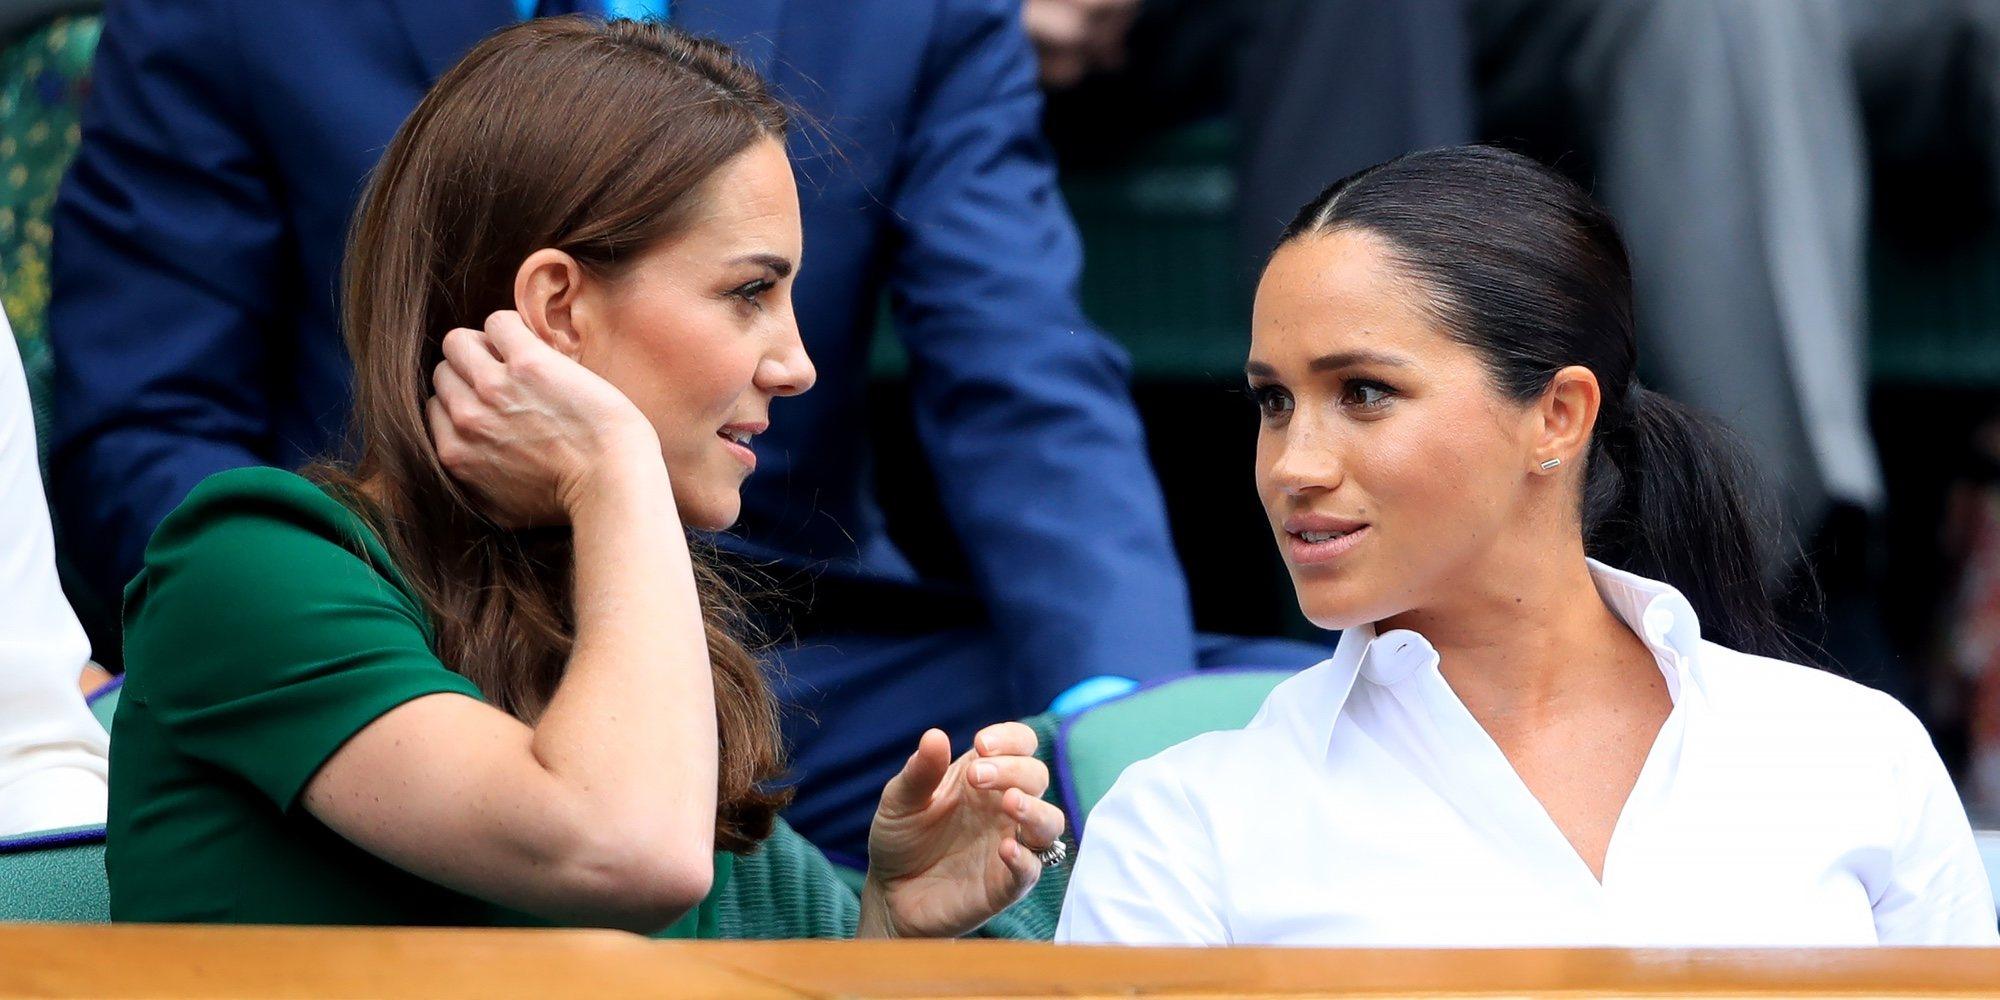 Kate Middleton y Meghan Markle muestran su buena relación en Wimbledon 2019 junto a Pippa Middleton